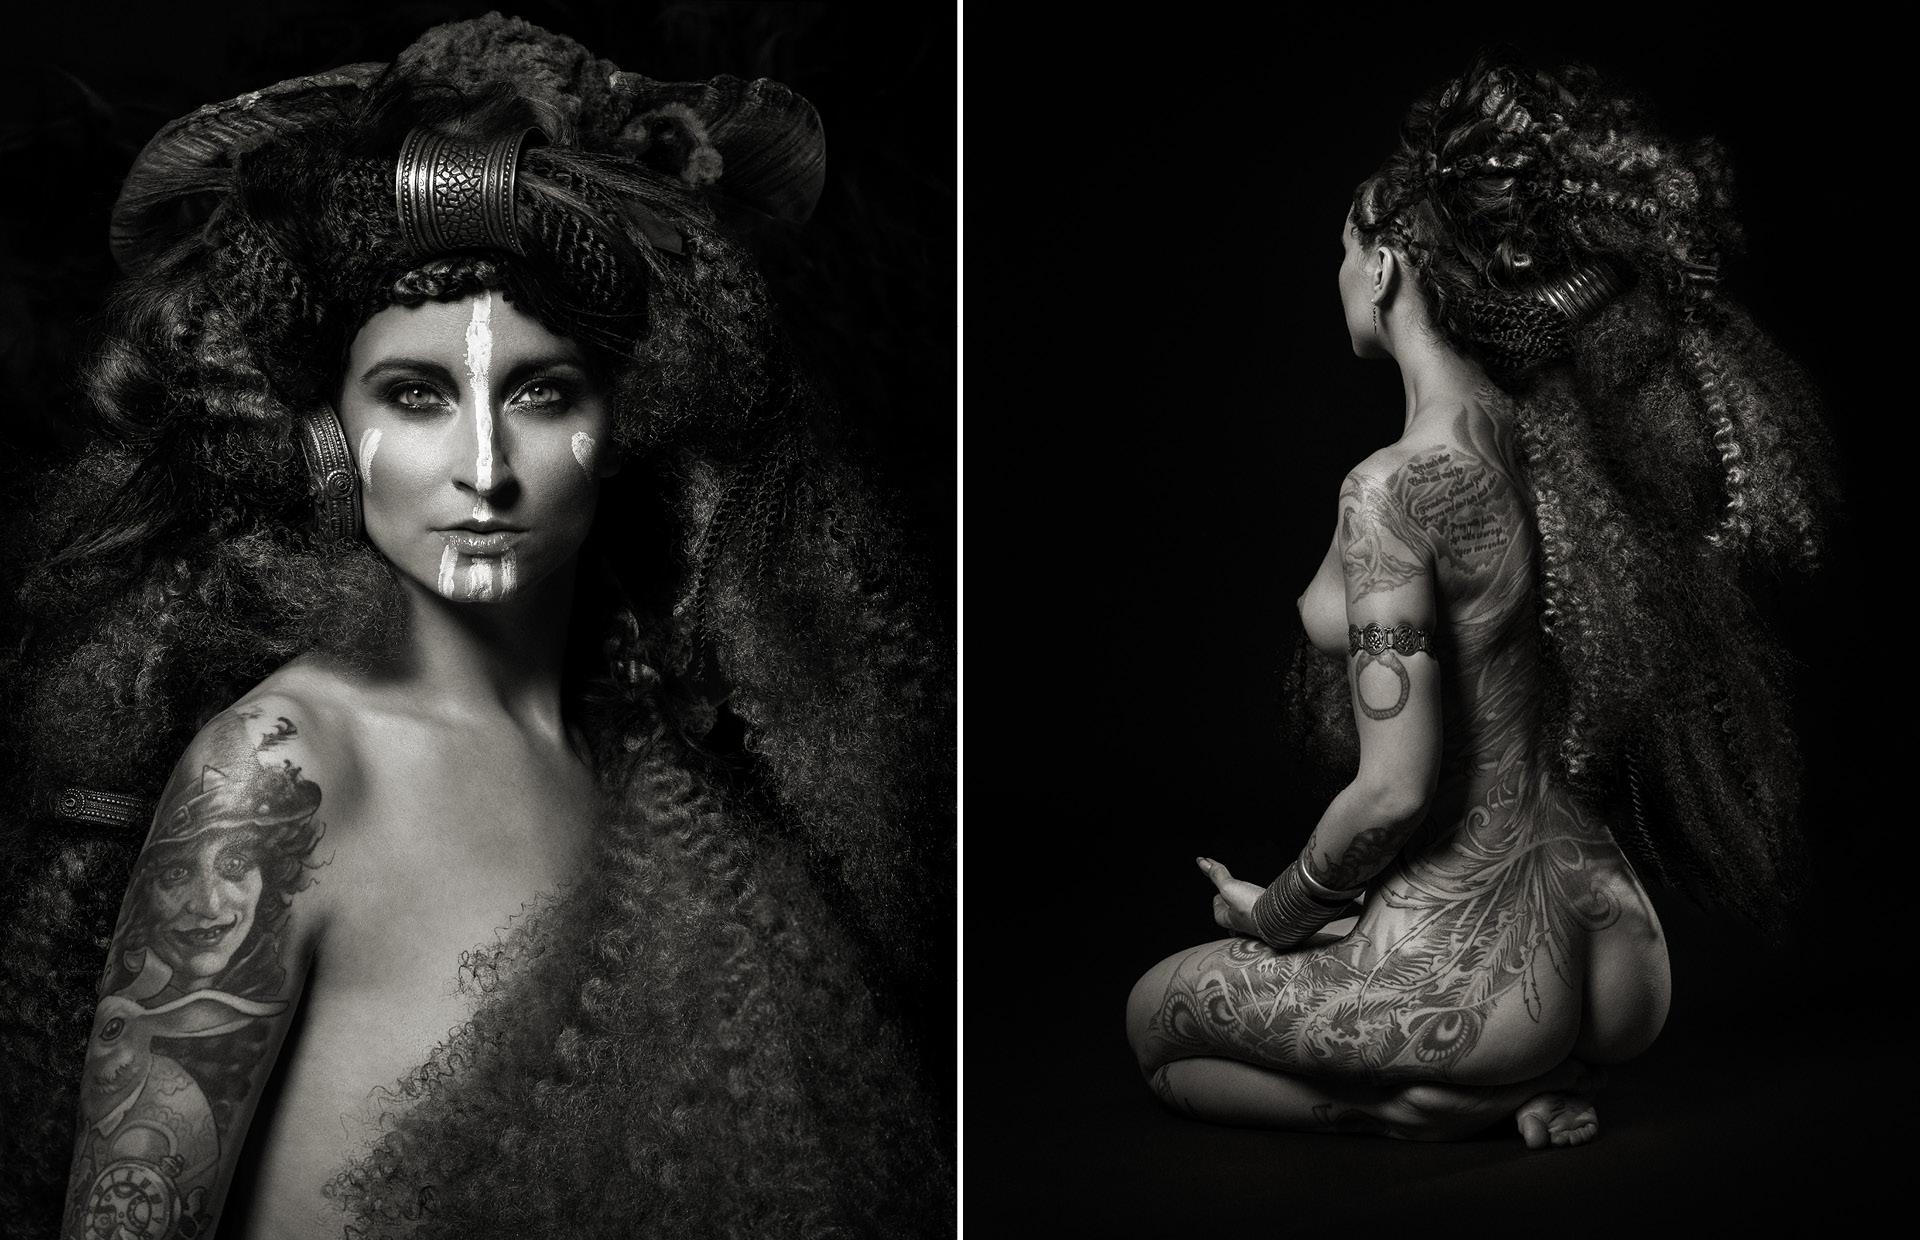 Spirit-&-Flesh-Magazine_Valkyrie-Ink_by-Reka-Nyari_